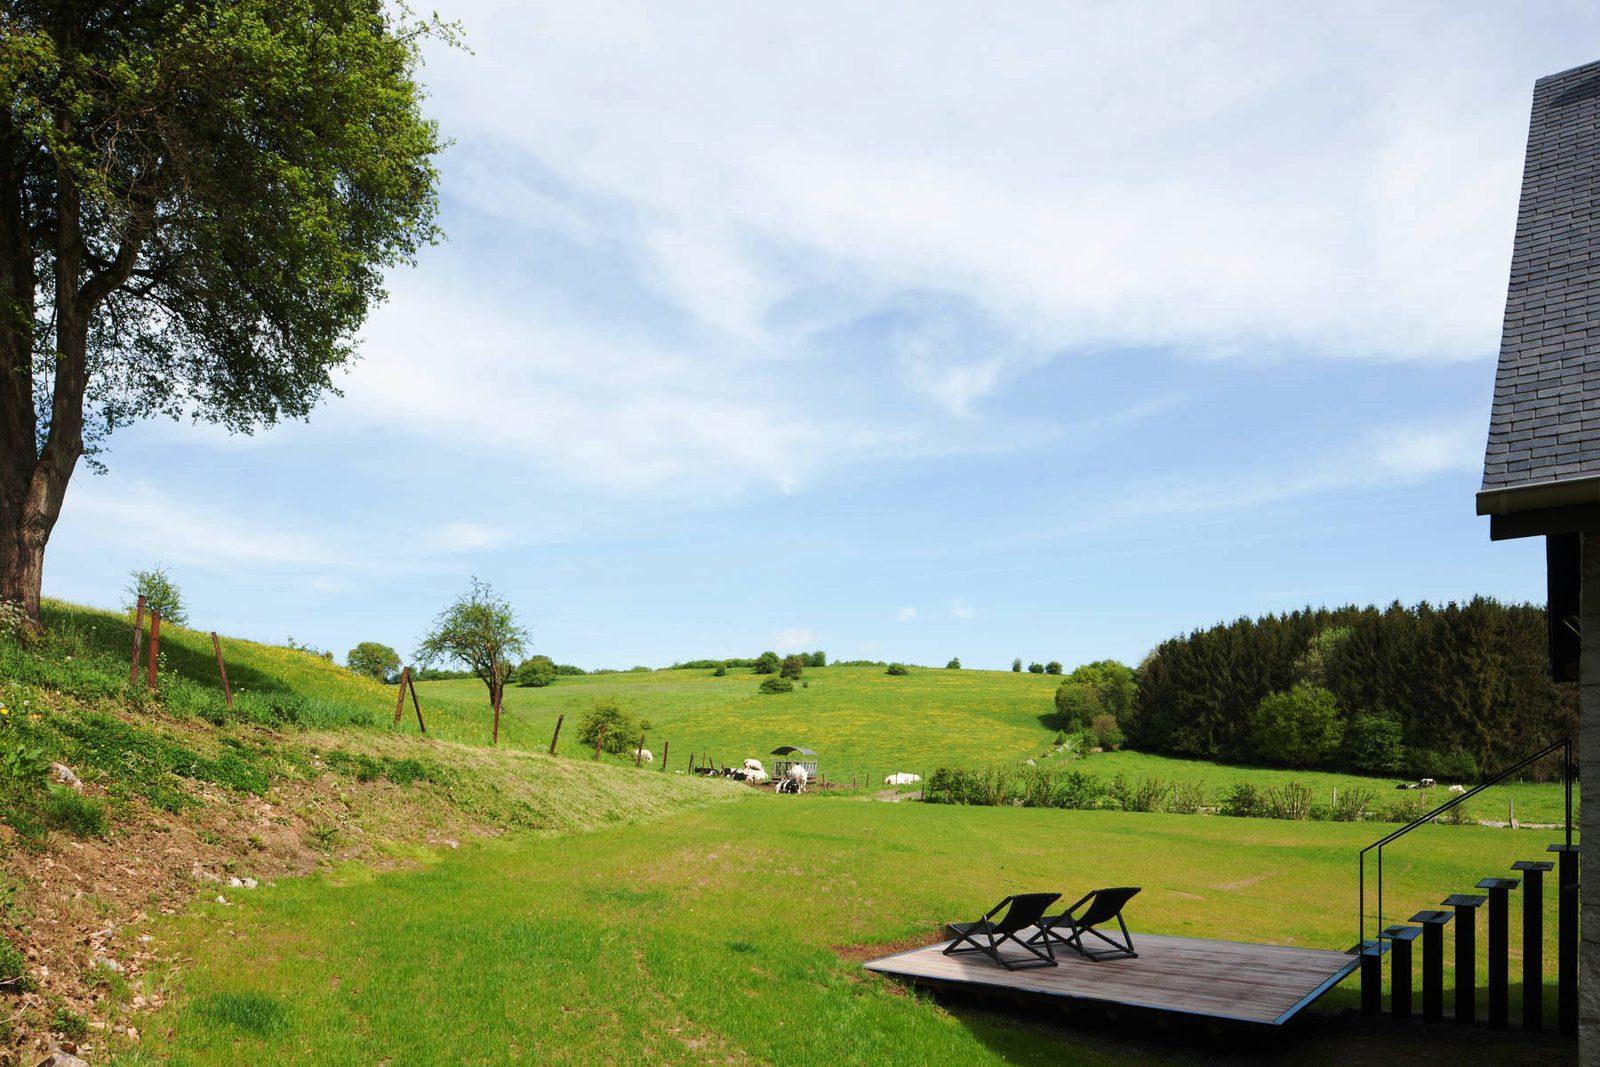 Belgie, Ardennen, Bioul, Station, la Micheline, luxe vakantiehuis, groepen, houtoven, design